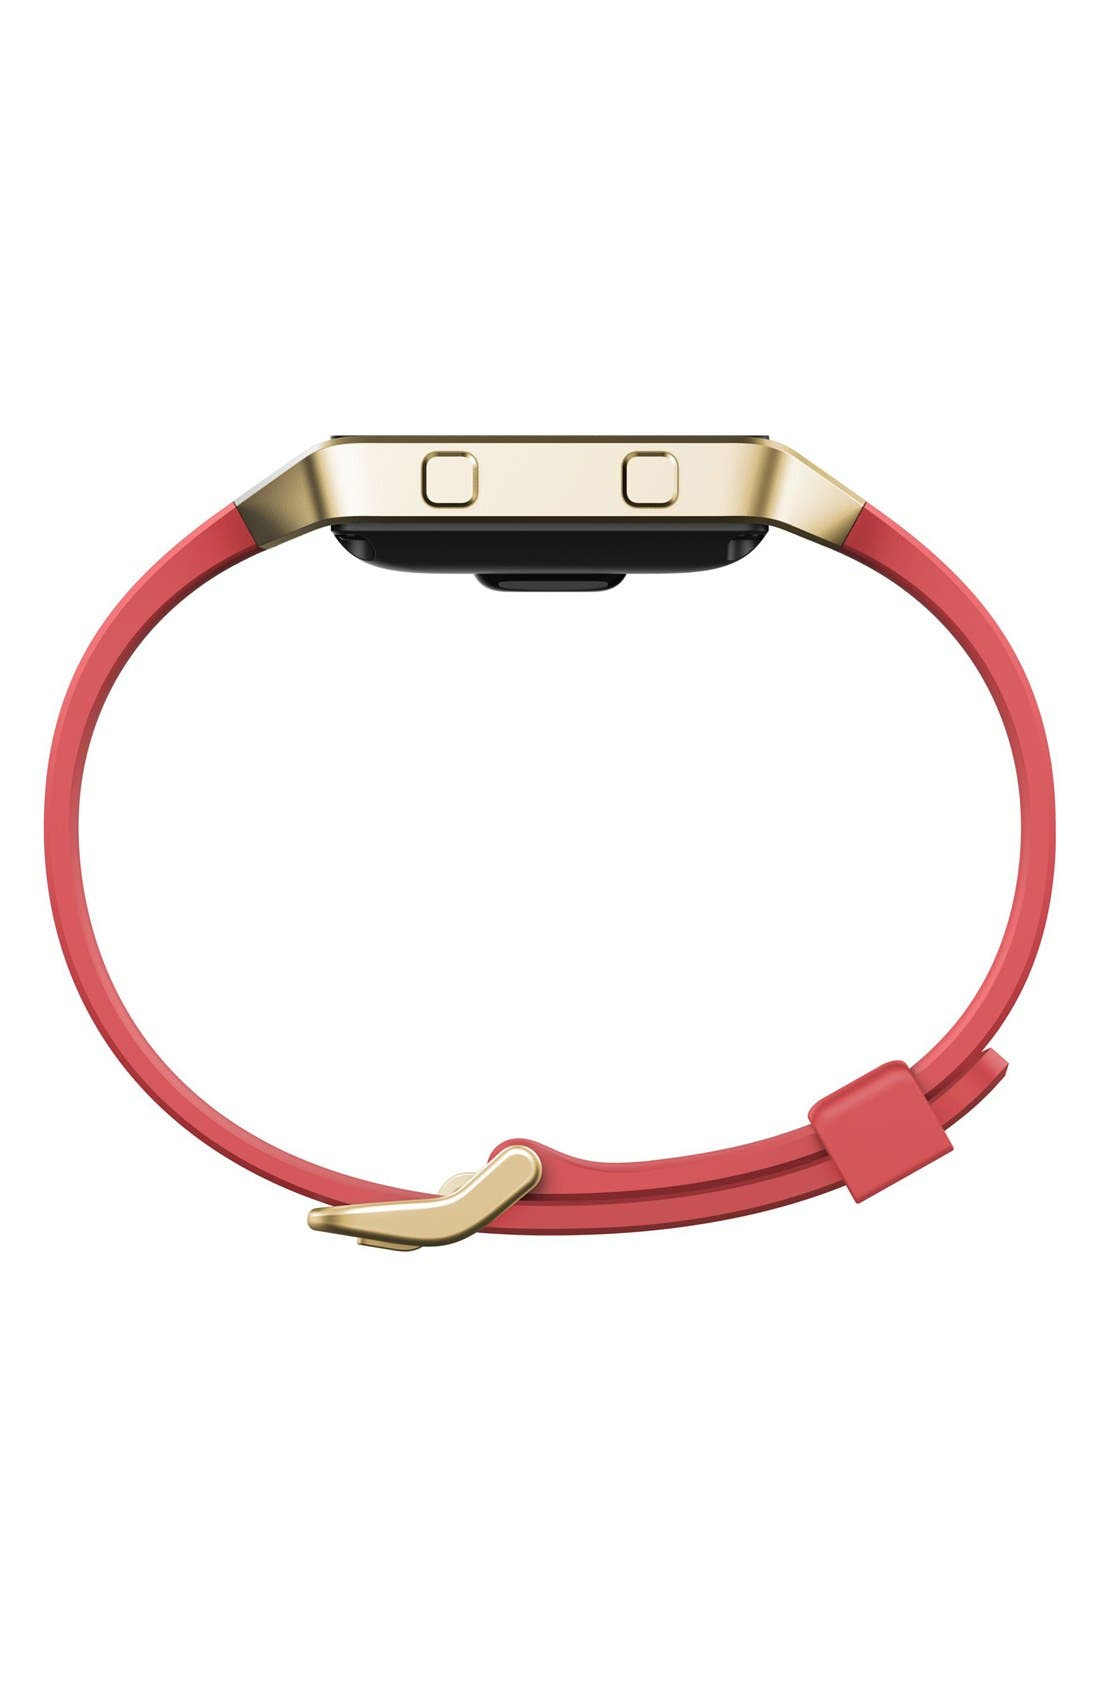 'Blaze' Slim Band Smart Fitness Watch, 40mm,                             Alternate thumbnail 2, color,                             650